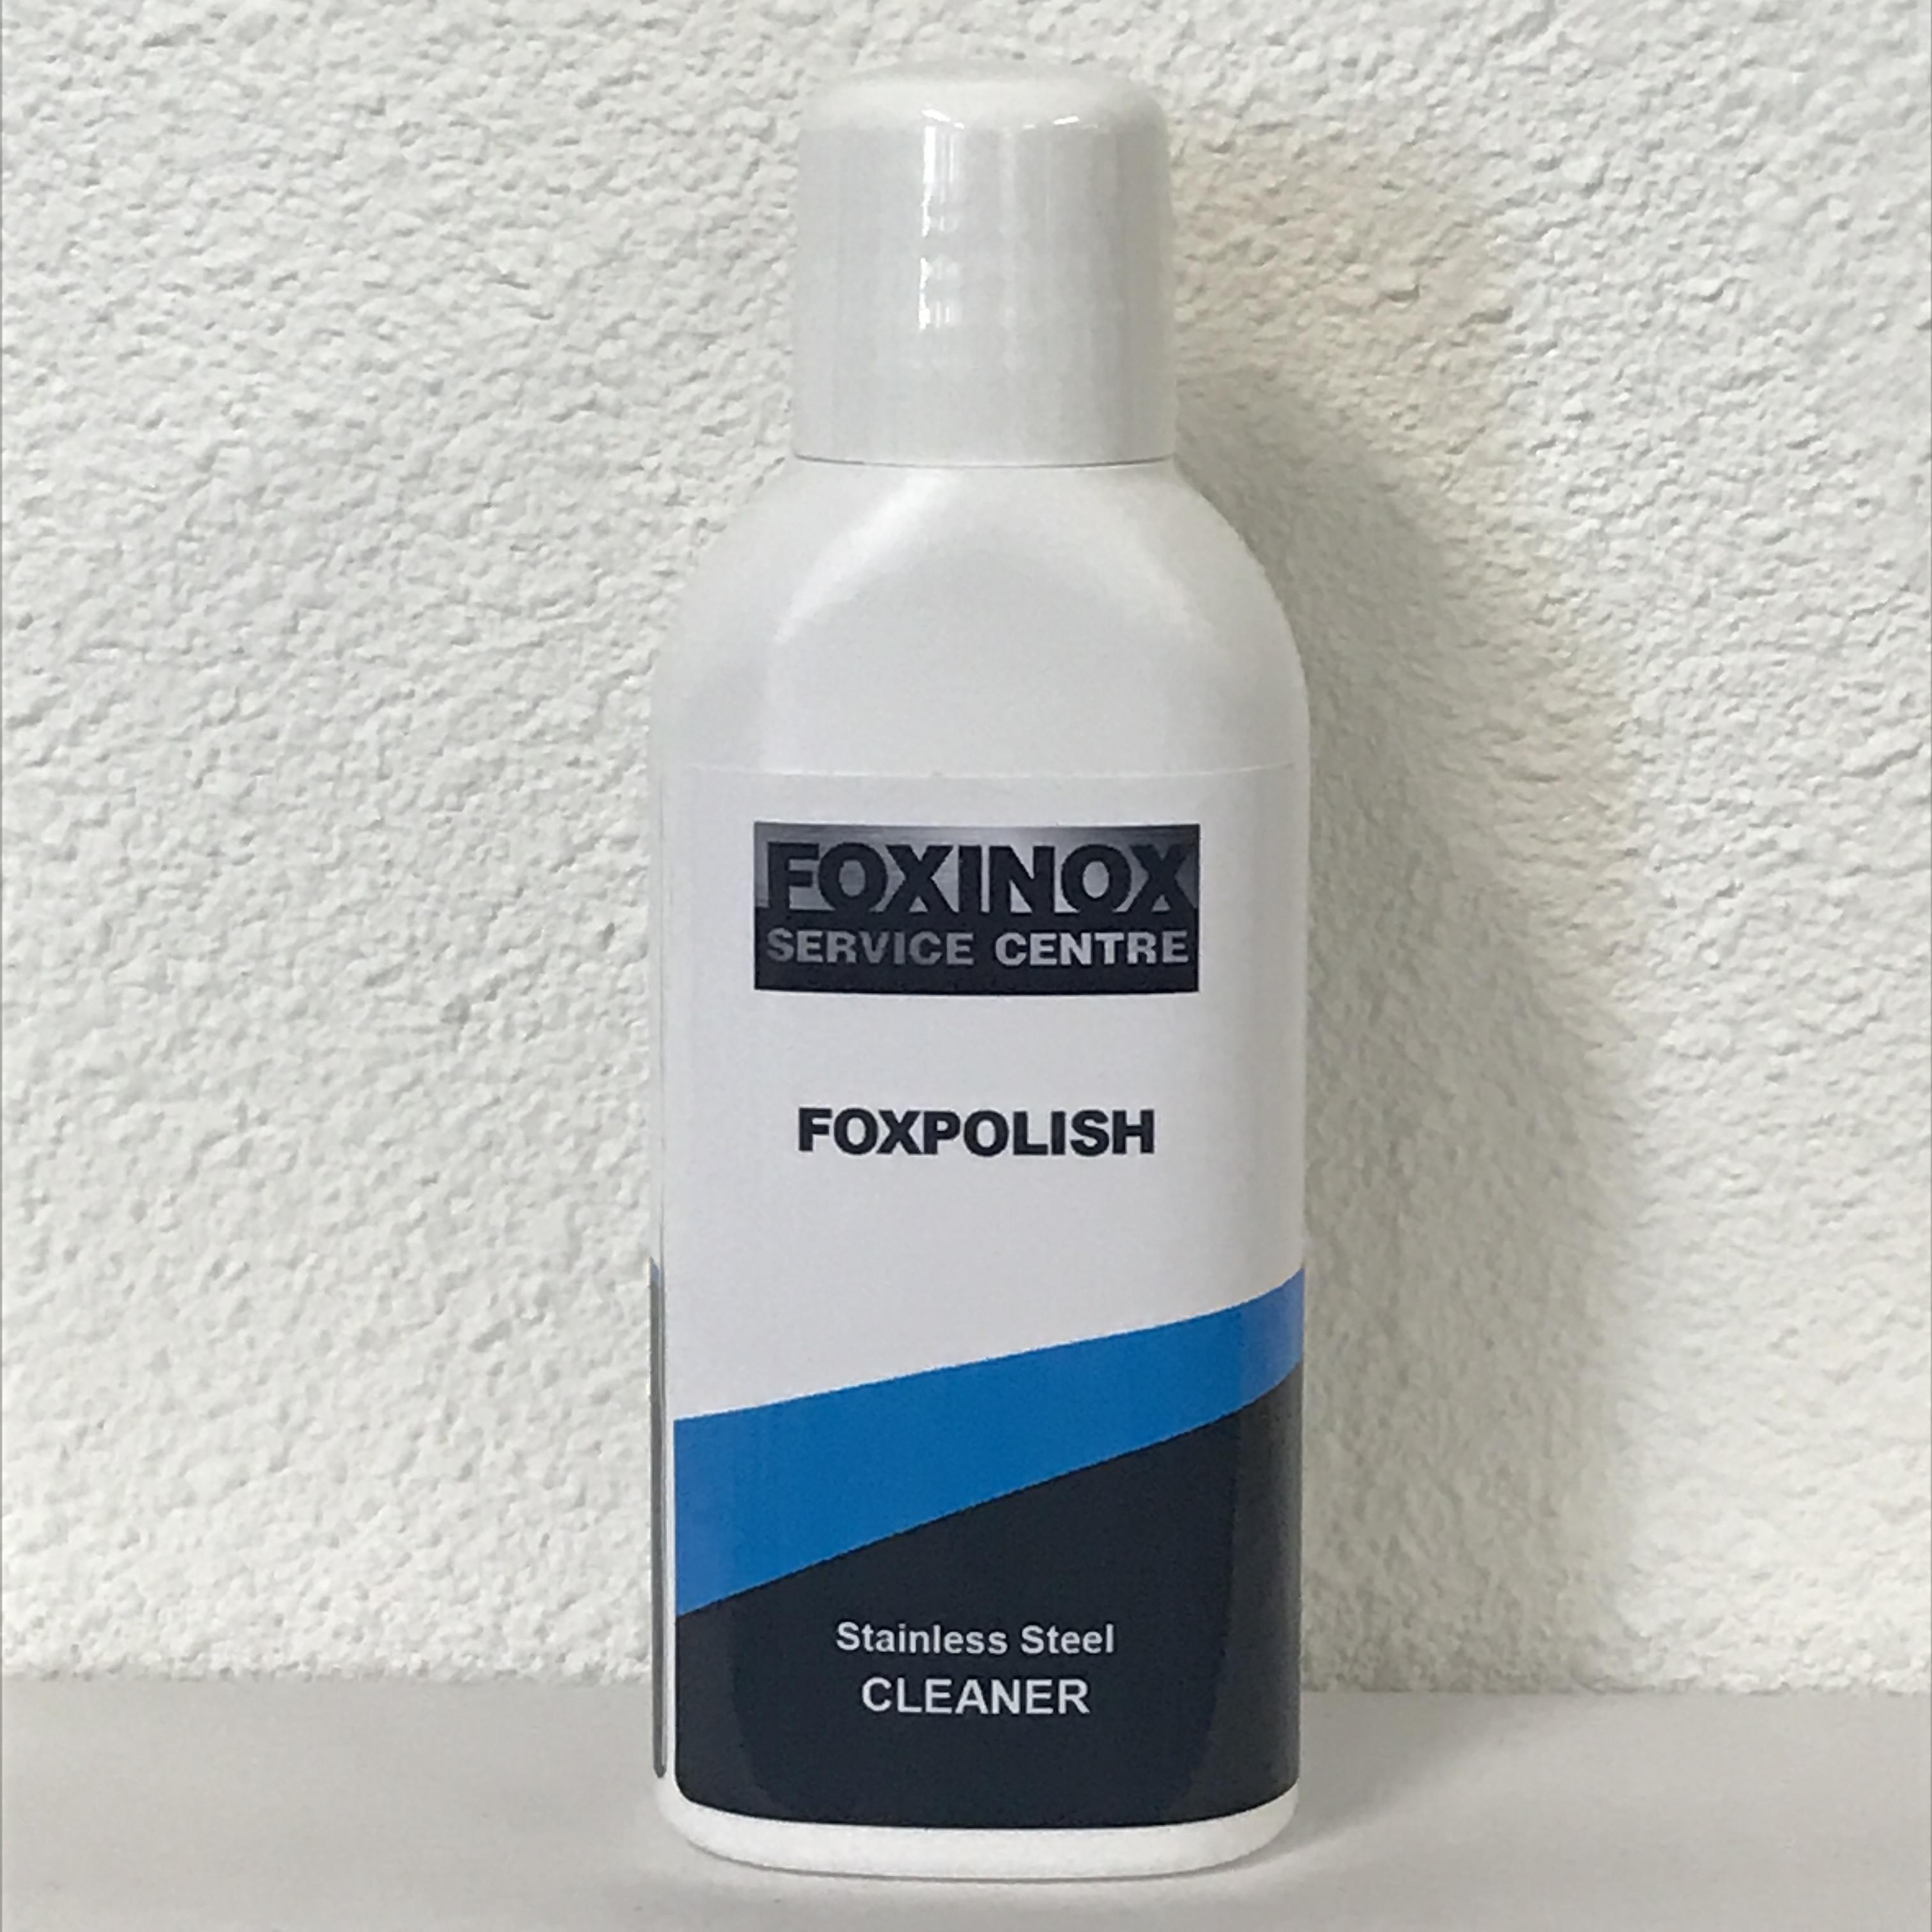 Foxpolish